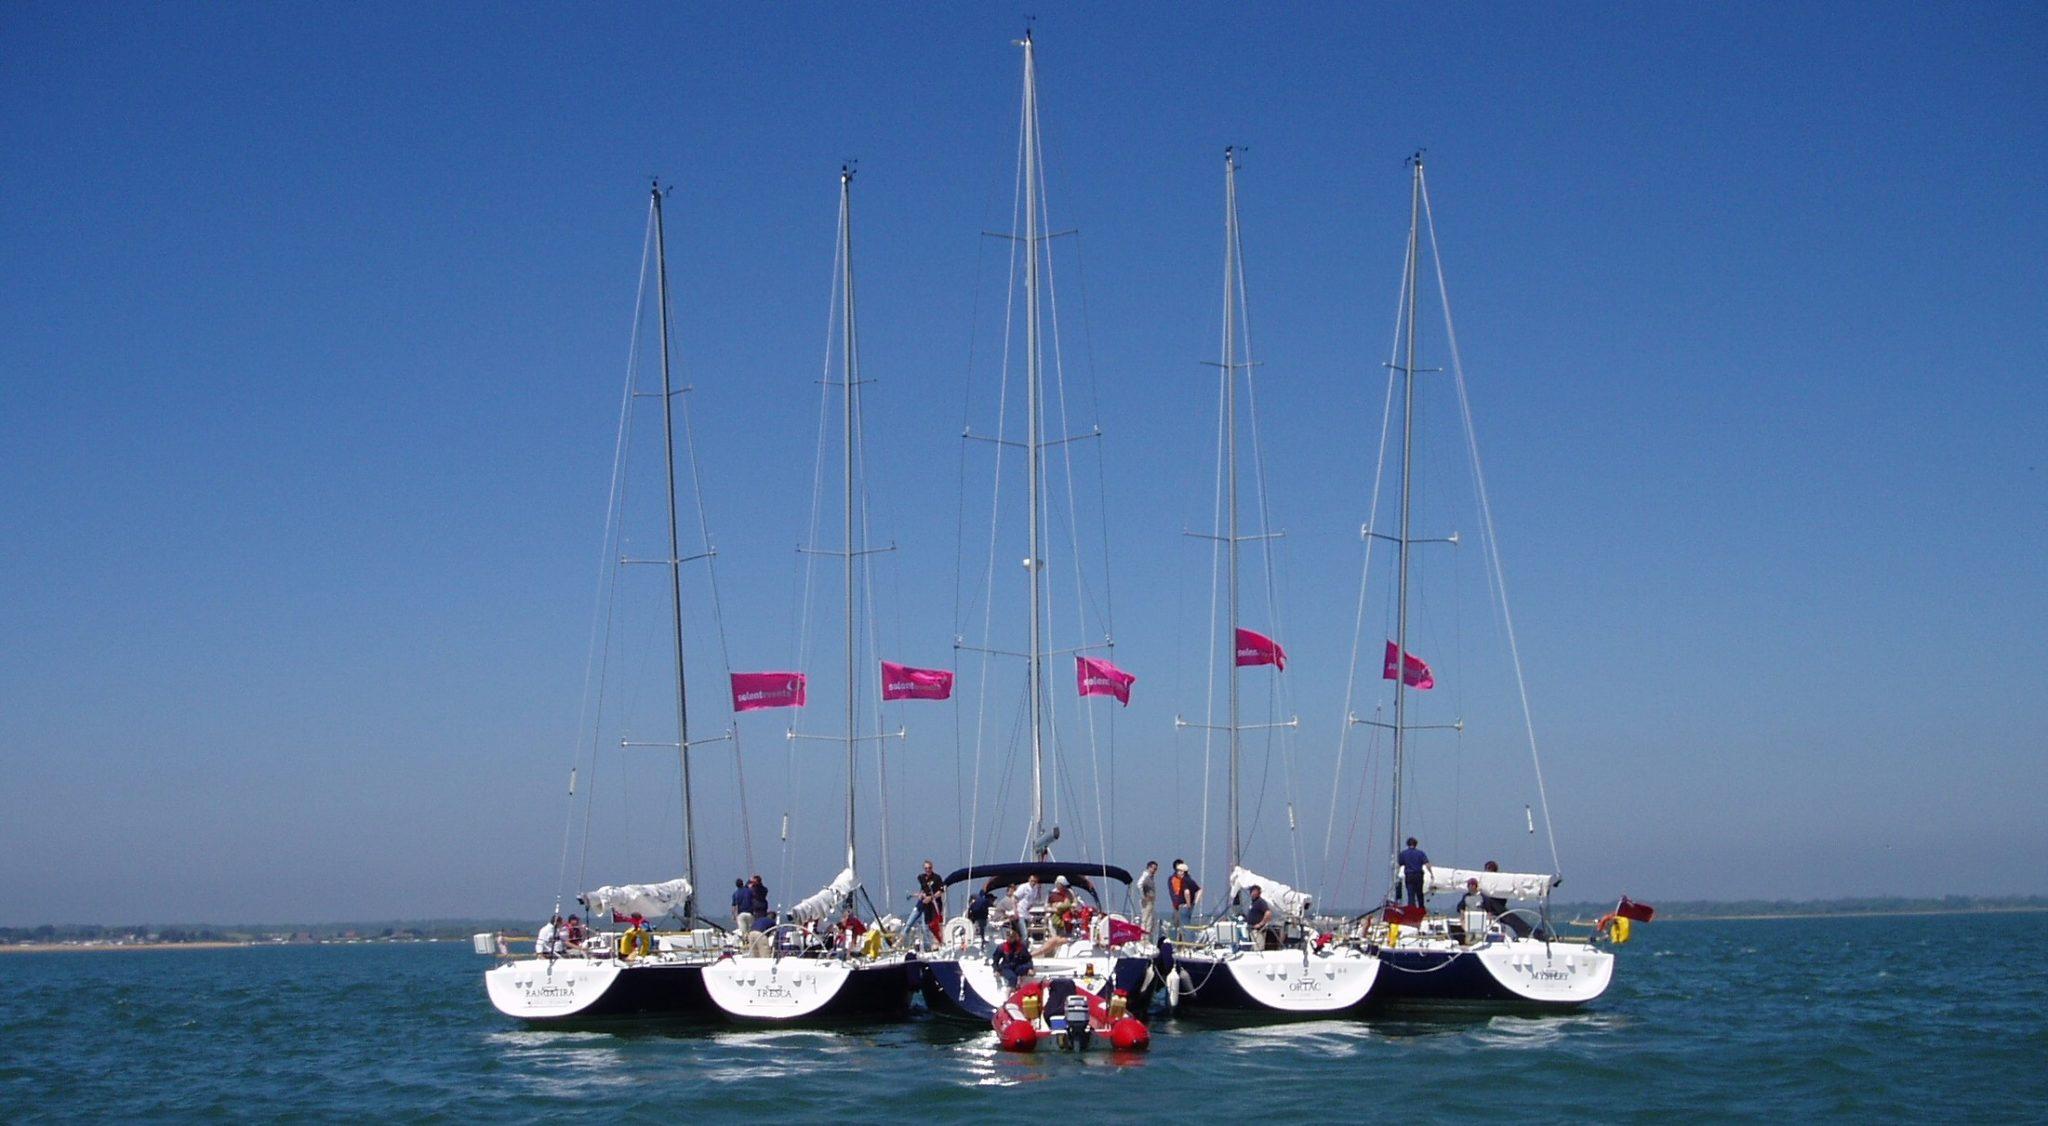 Team Sailing - Team Building - The Events Company